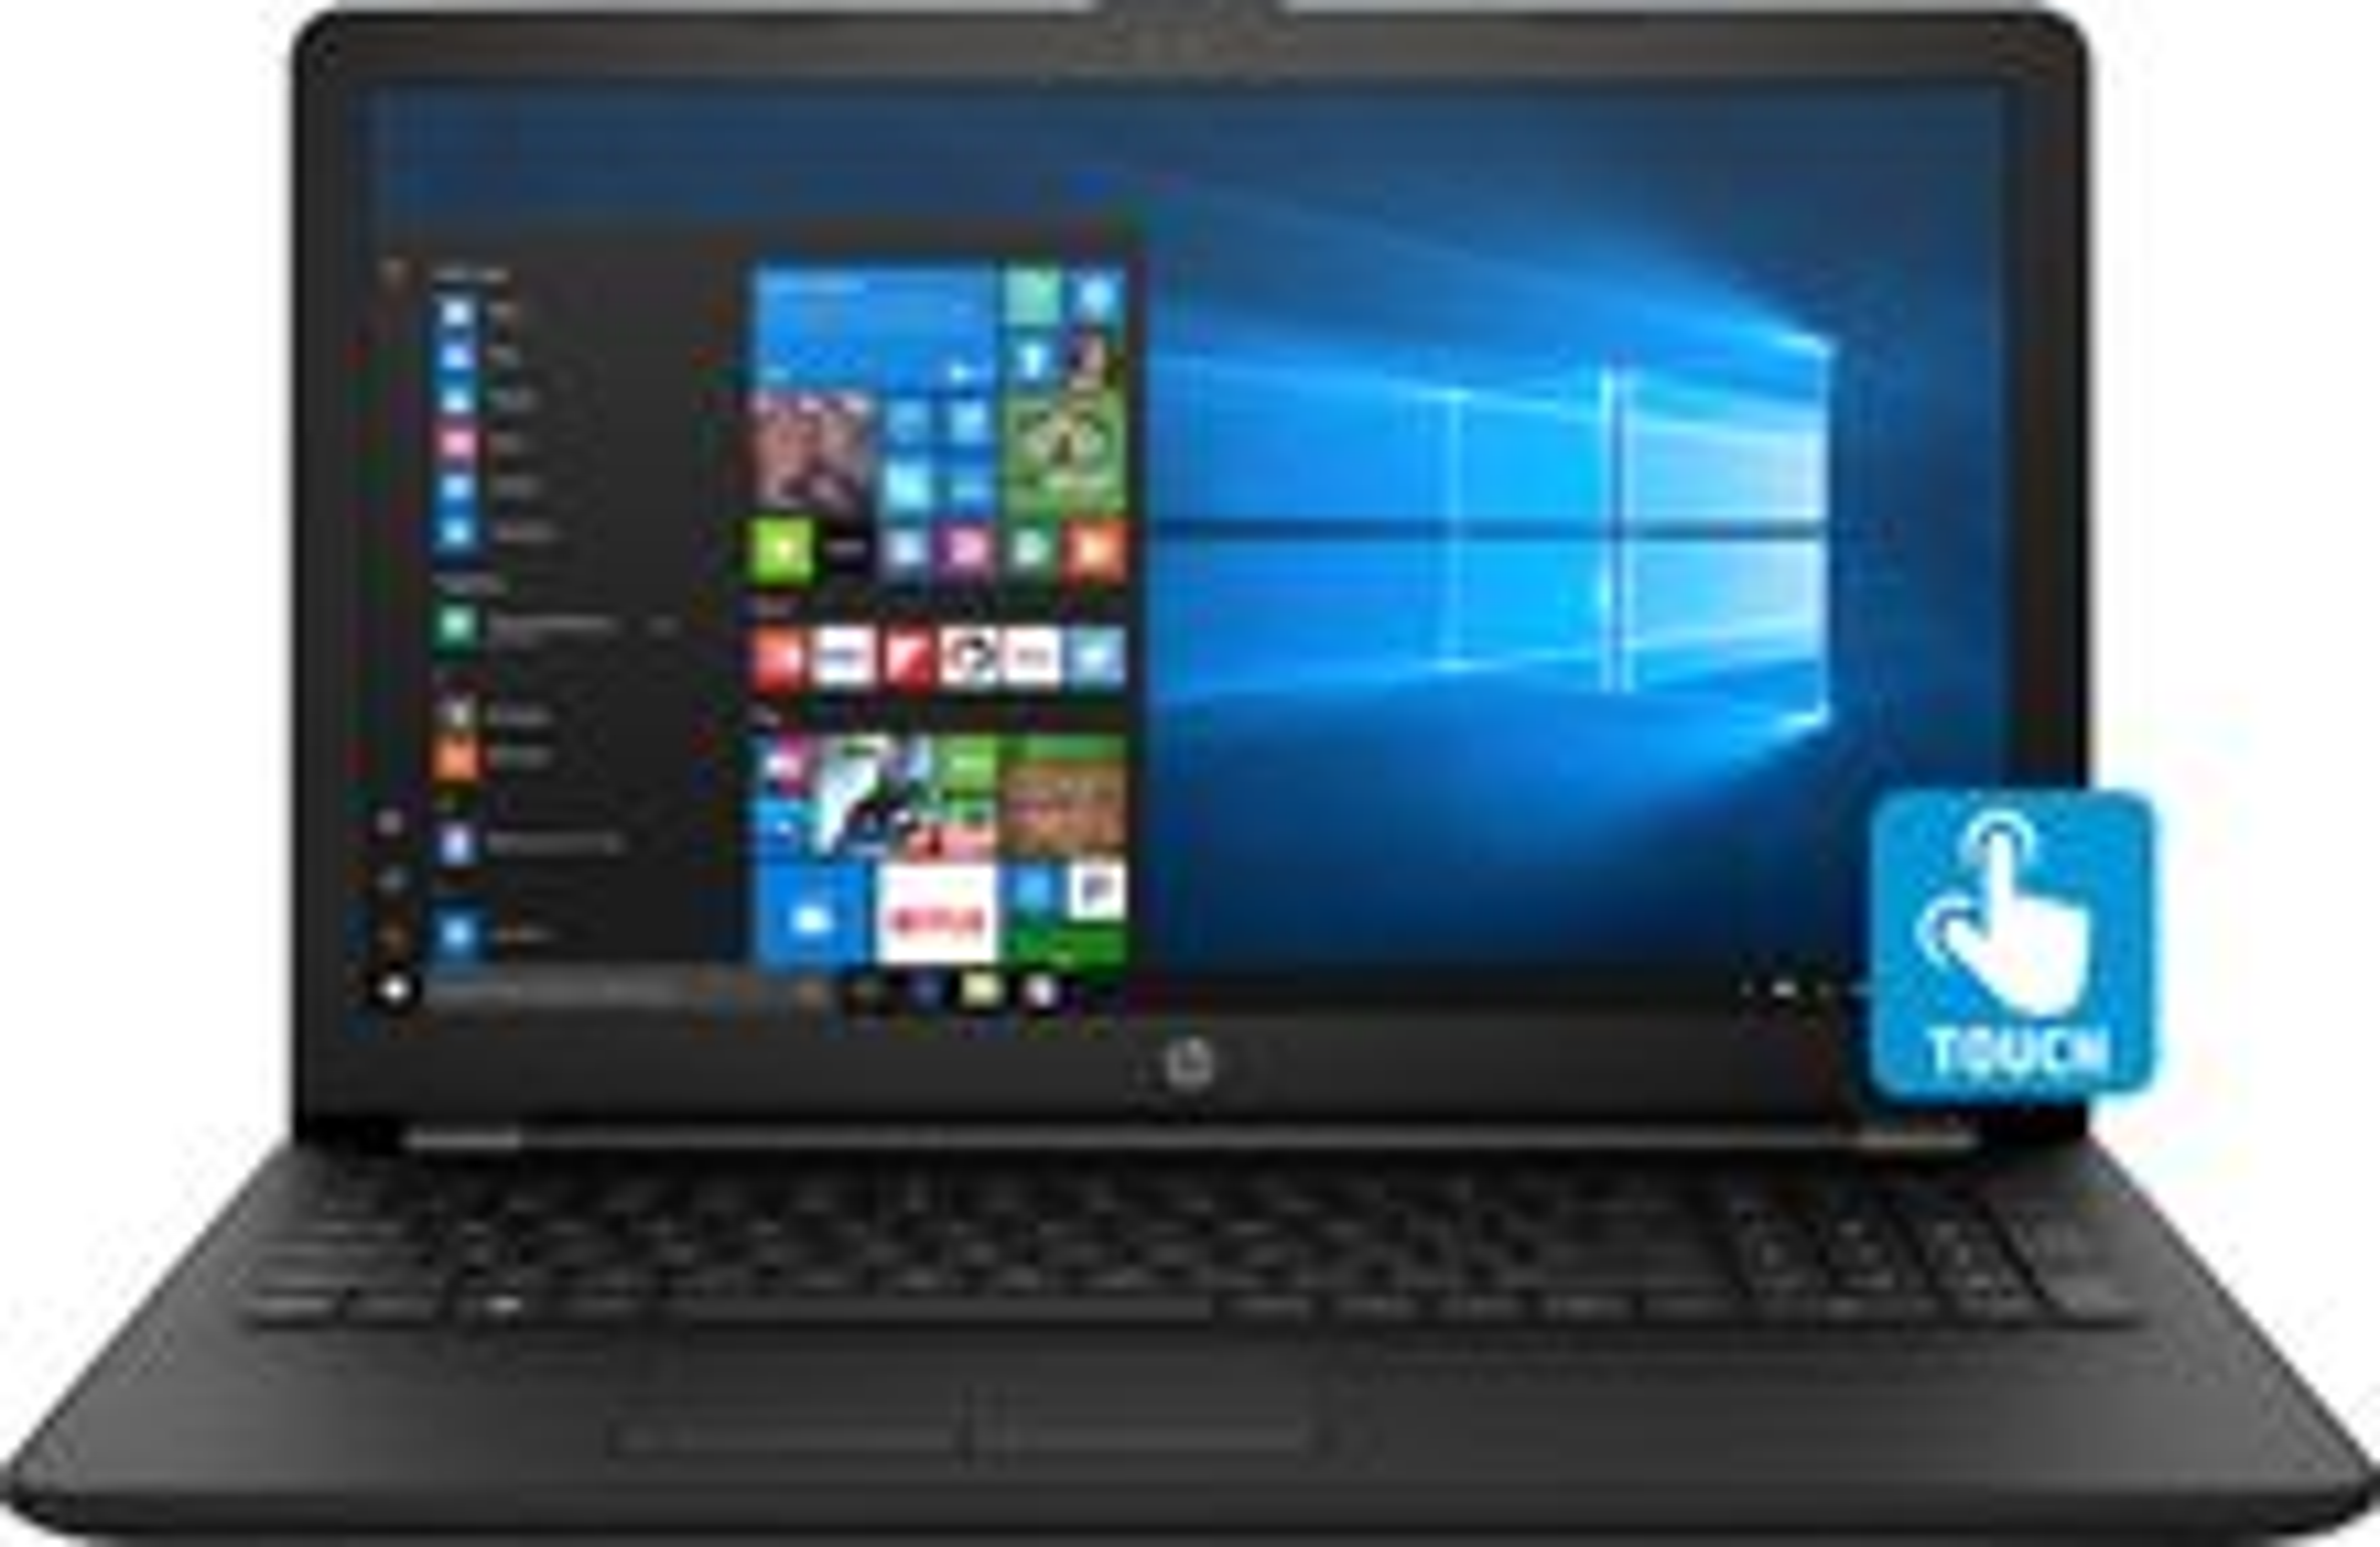 "HP - 15.6"" Touch-Screen Laptop - Intel Core i3 - 8GB Memory - 1TB Hard Drive - HP Finish In Jet Black"